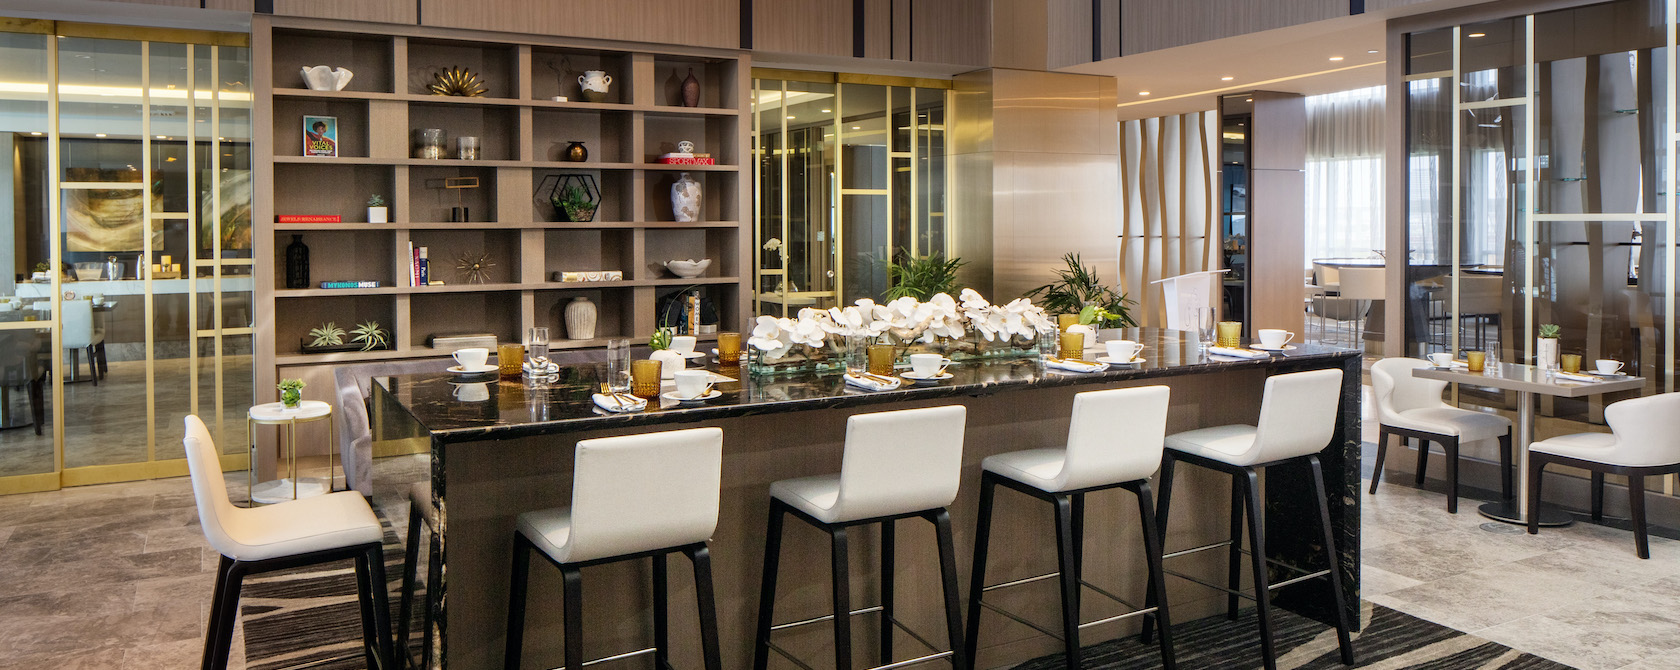 Dining room at the Hilton Aventura Miami